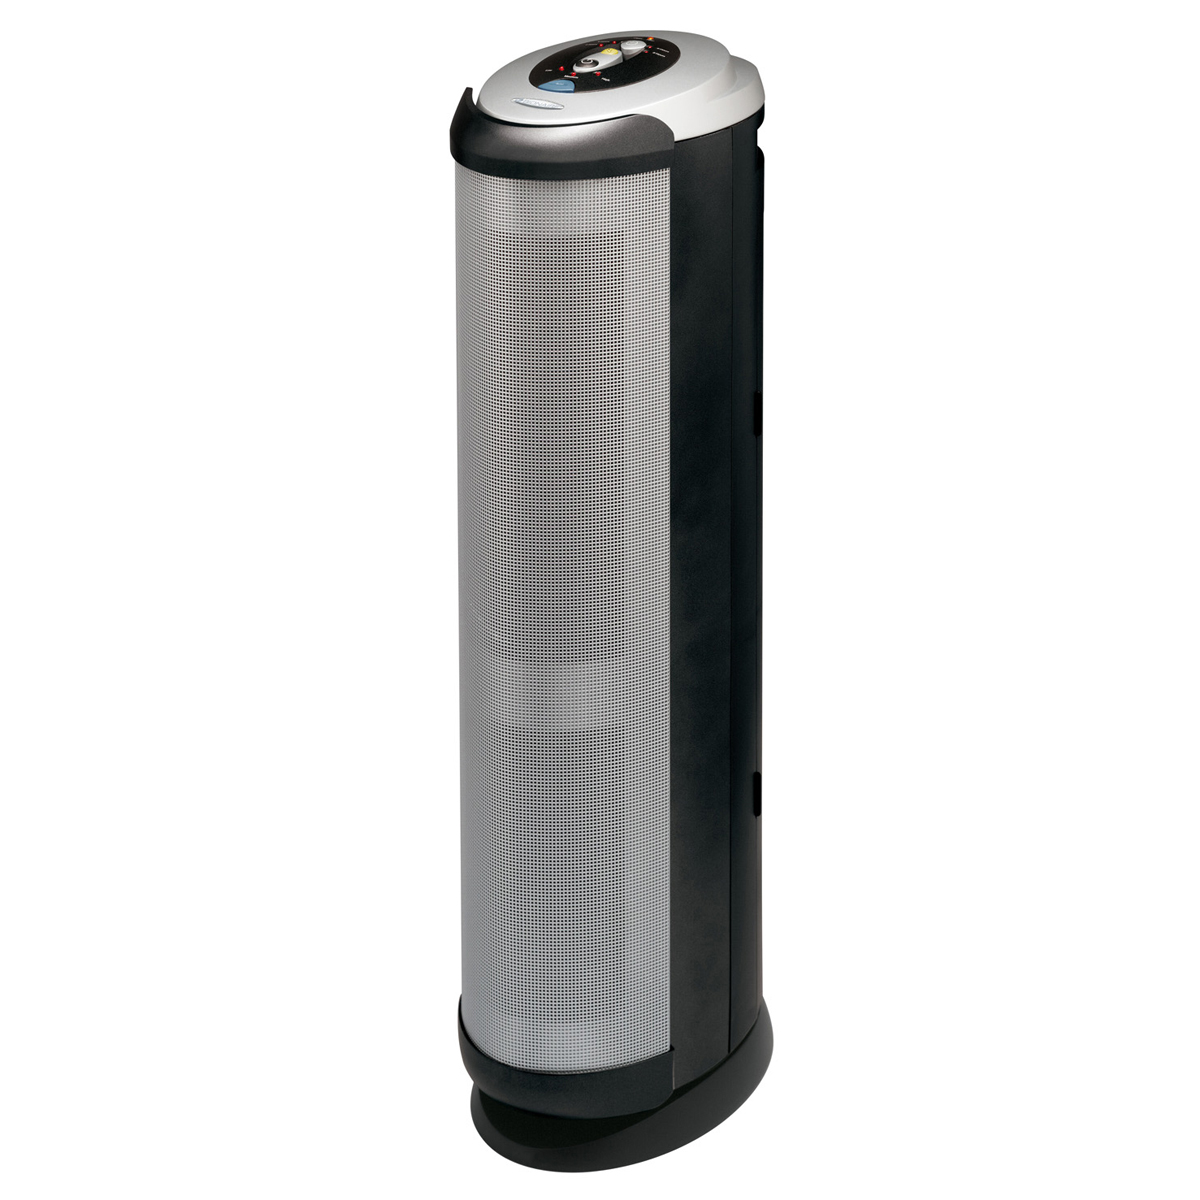 Varisized Hepa Air Filter : Bionaire true hepa tower air purifier bap cn